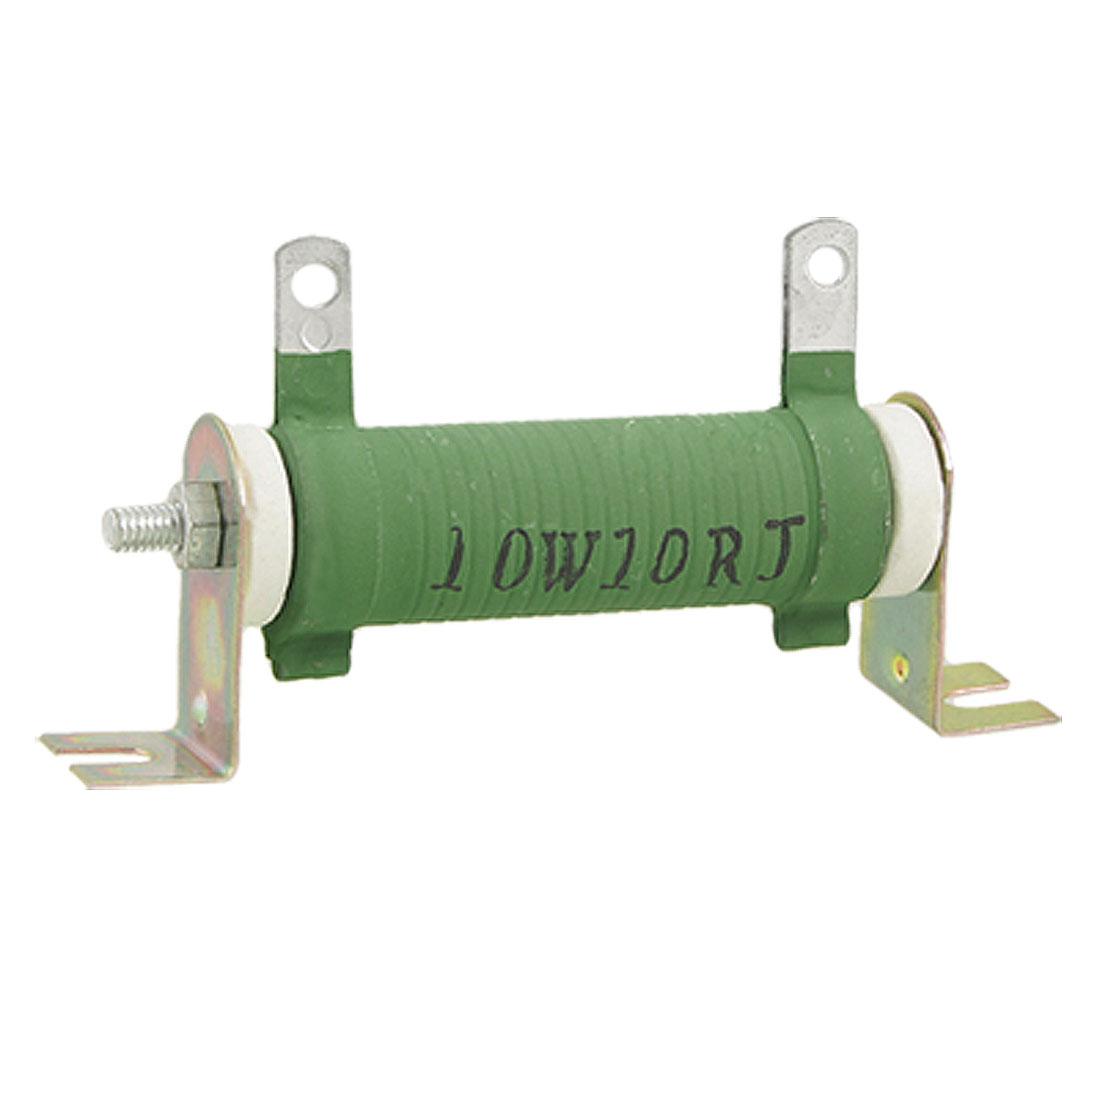 Ceramic Tube Fixed Type Wirewound Resistor 10W 10 Ohm 10R